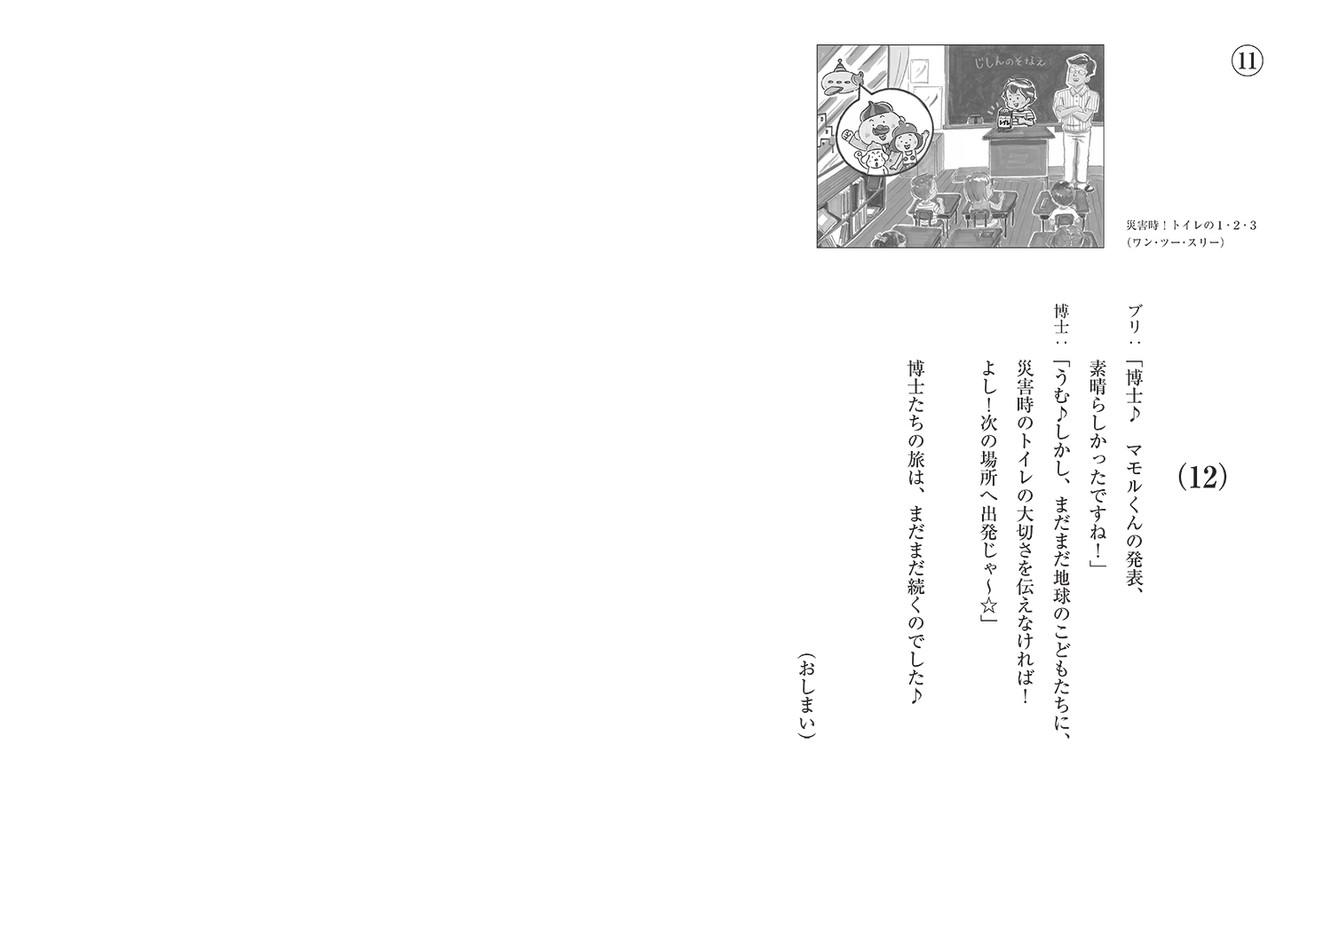 kanaweb_toiletkamishibai_024.jpg